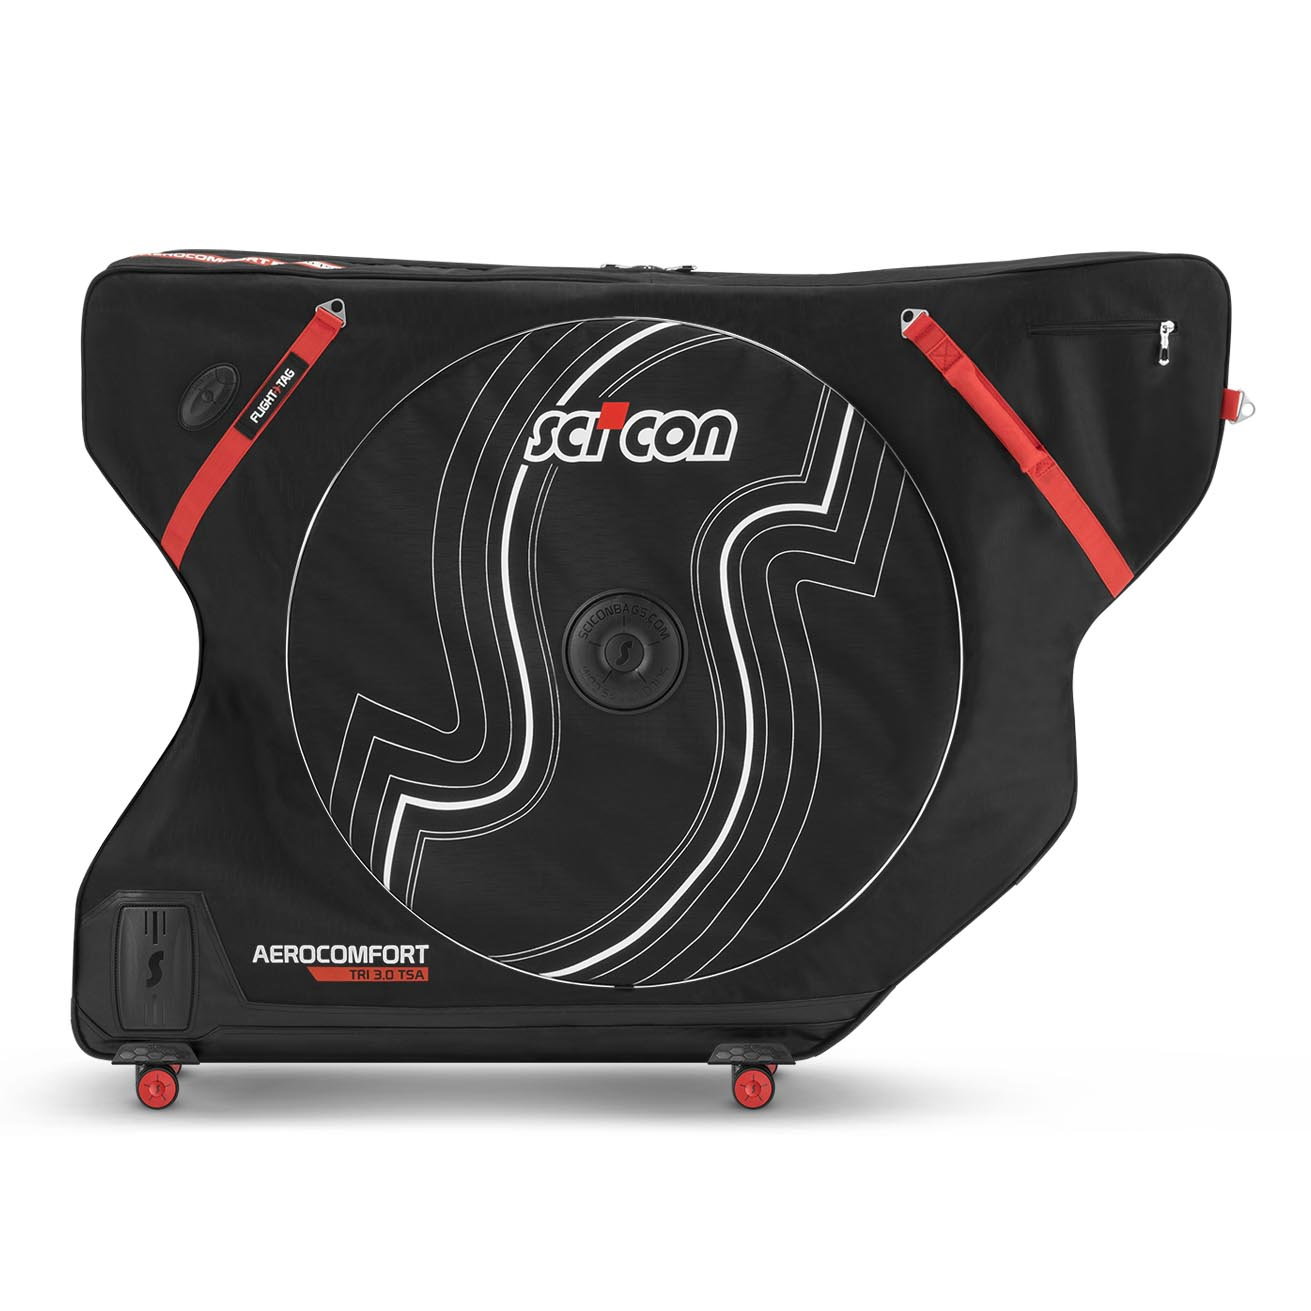 AeroComfort 3.0 TSA triathlon